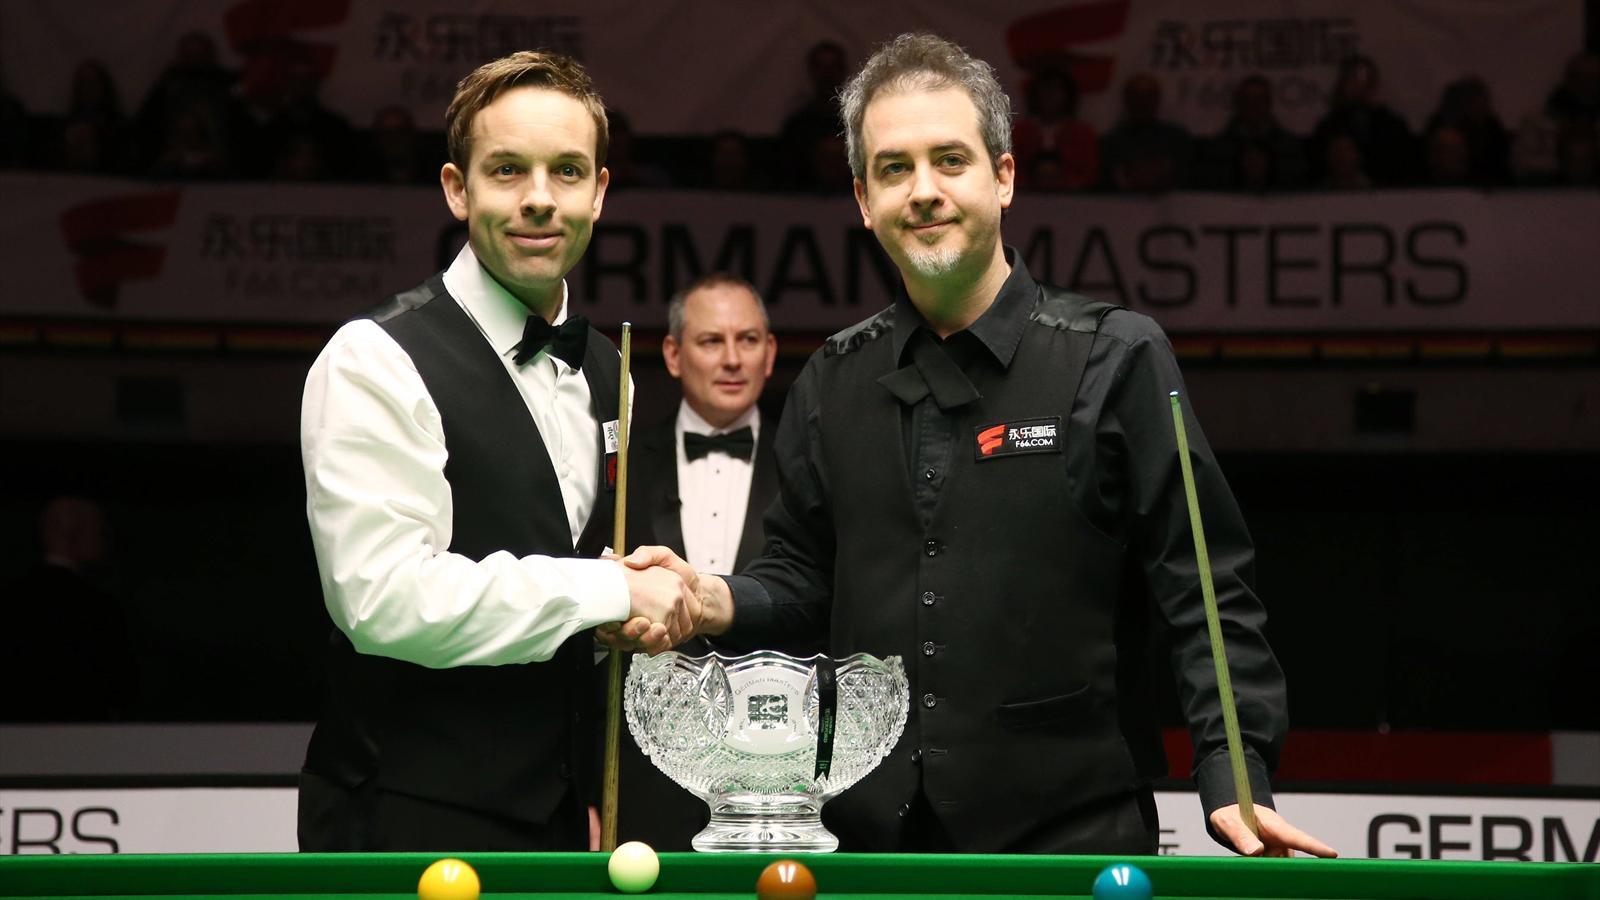 Snooker masters 2020 ergebnisse